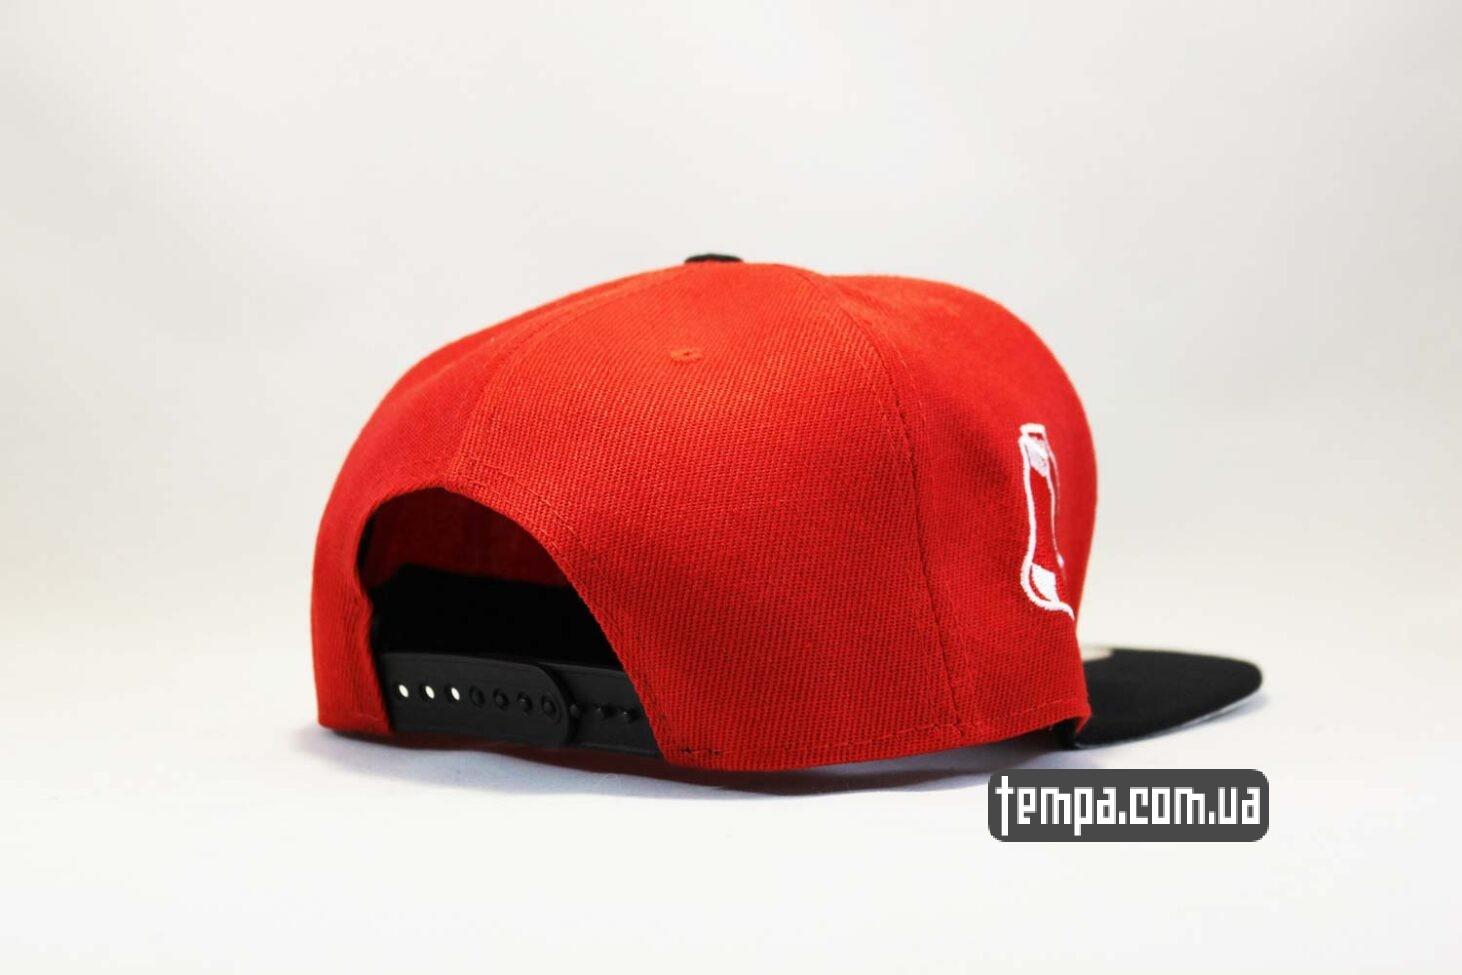 одежда для бейсбола кепка snapback красная New Era RED SOX оригинал 9fifty